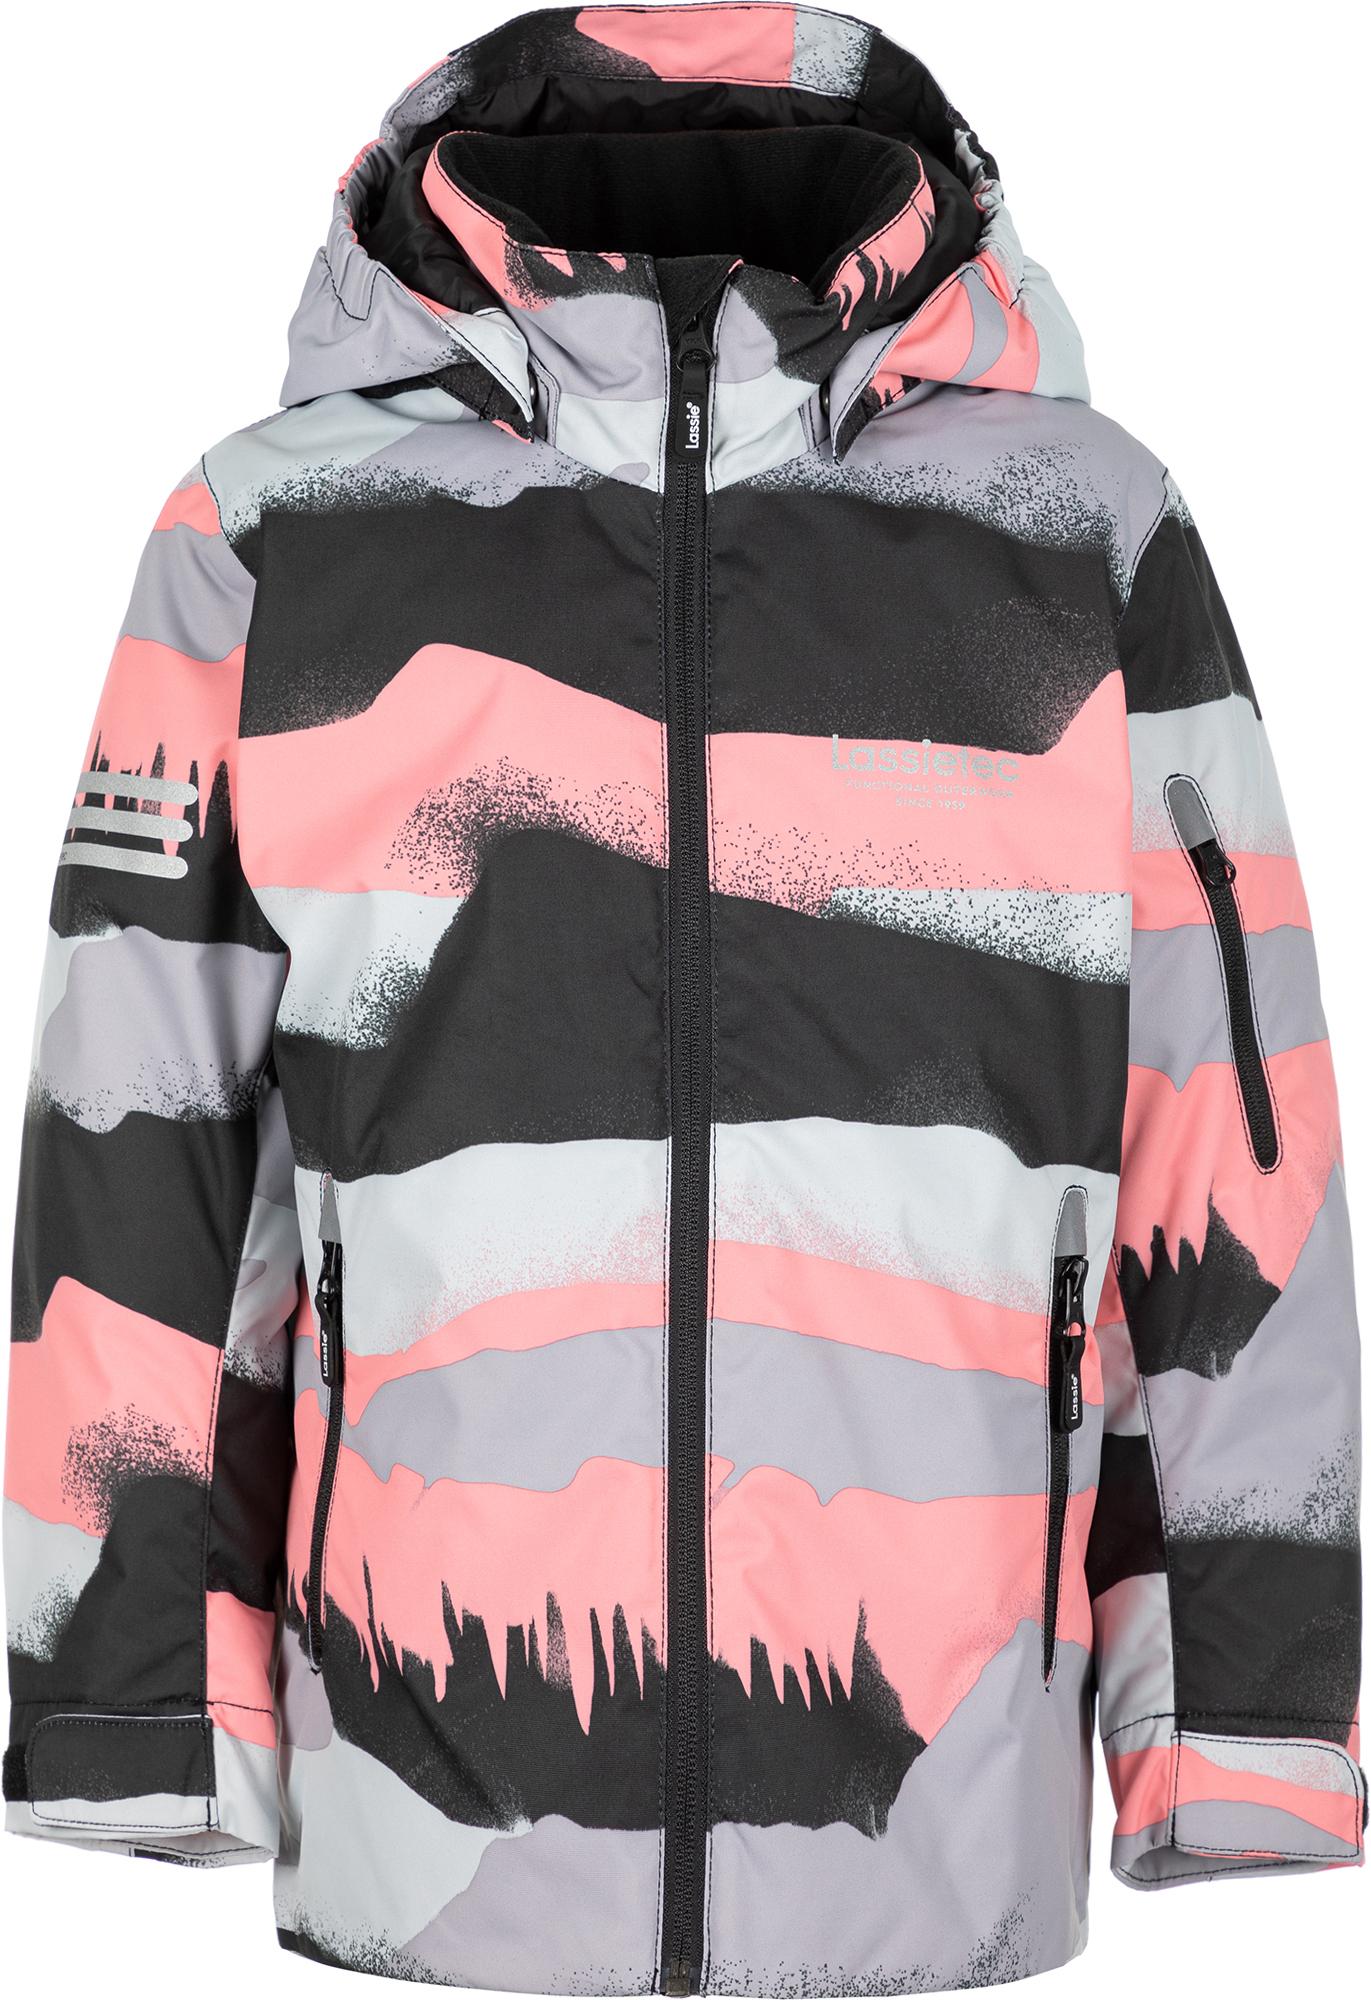 цены Lassie Куртка утепленная для девочек Lassie Timka, размер 128